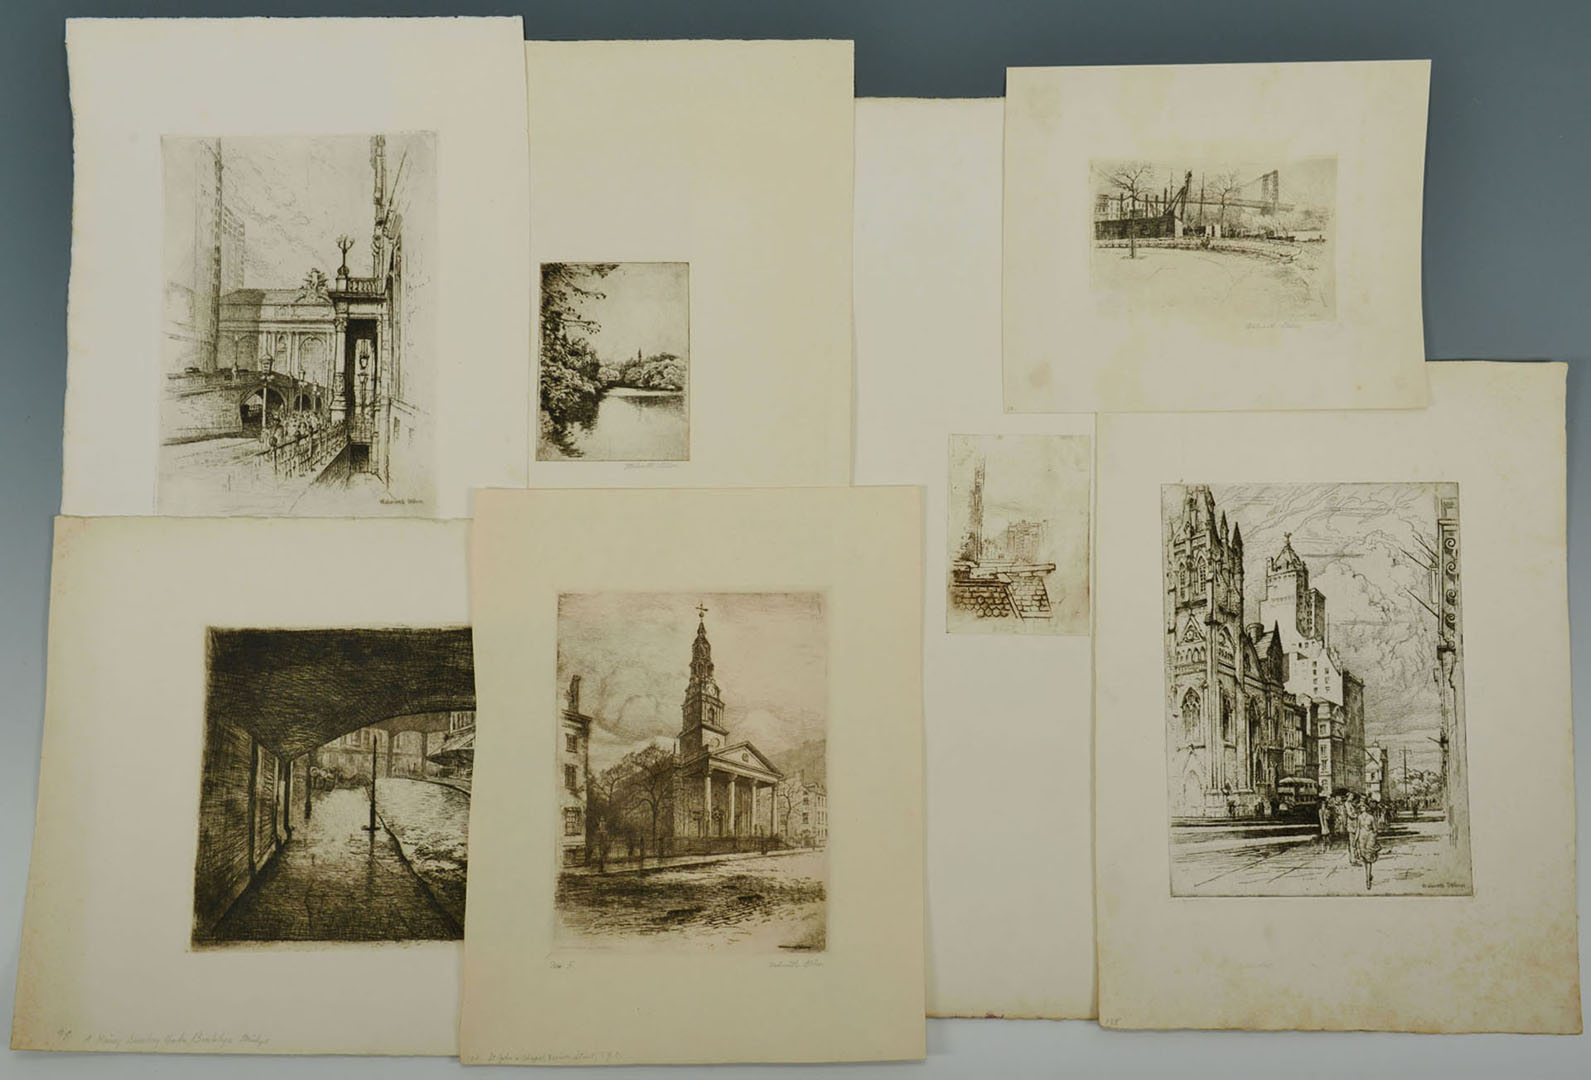 Lot 2872267: Walworth Stilson Etchings of New York City, 7 tota